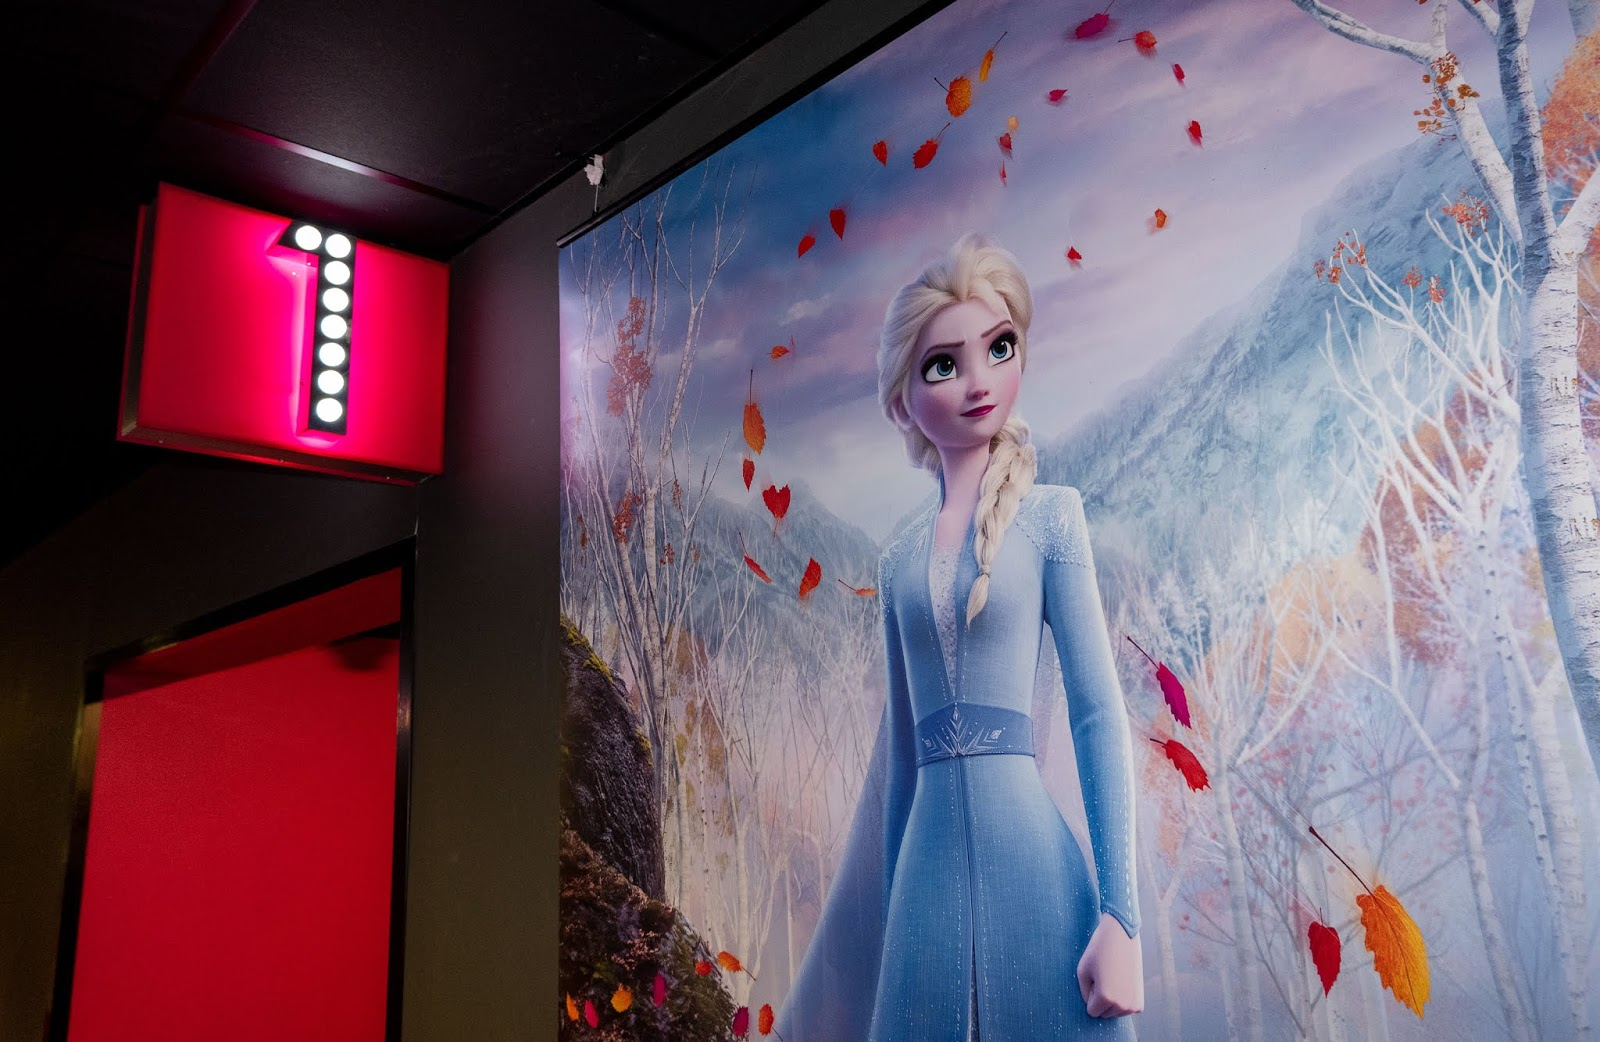 Frozen 2 poster at Empire Cinemas